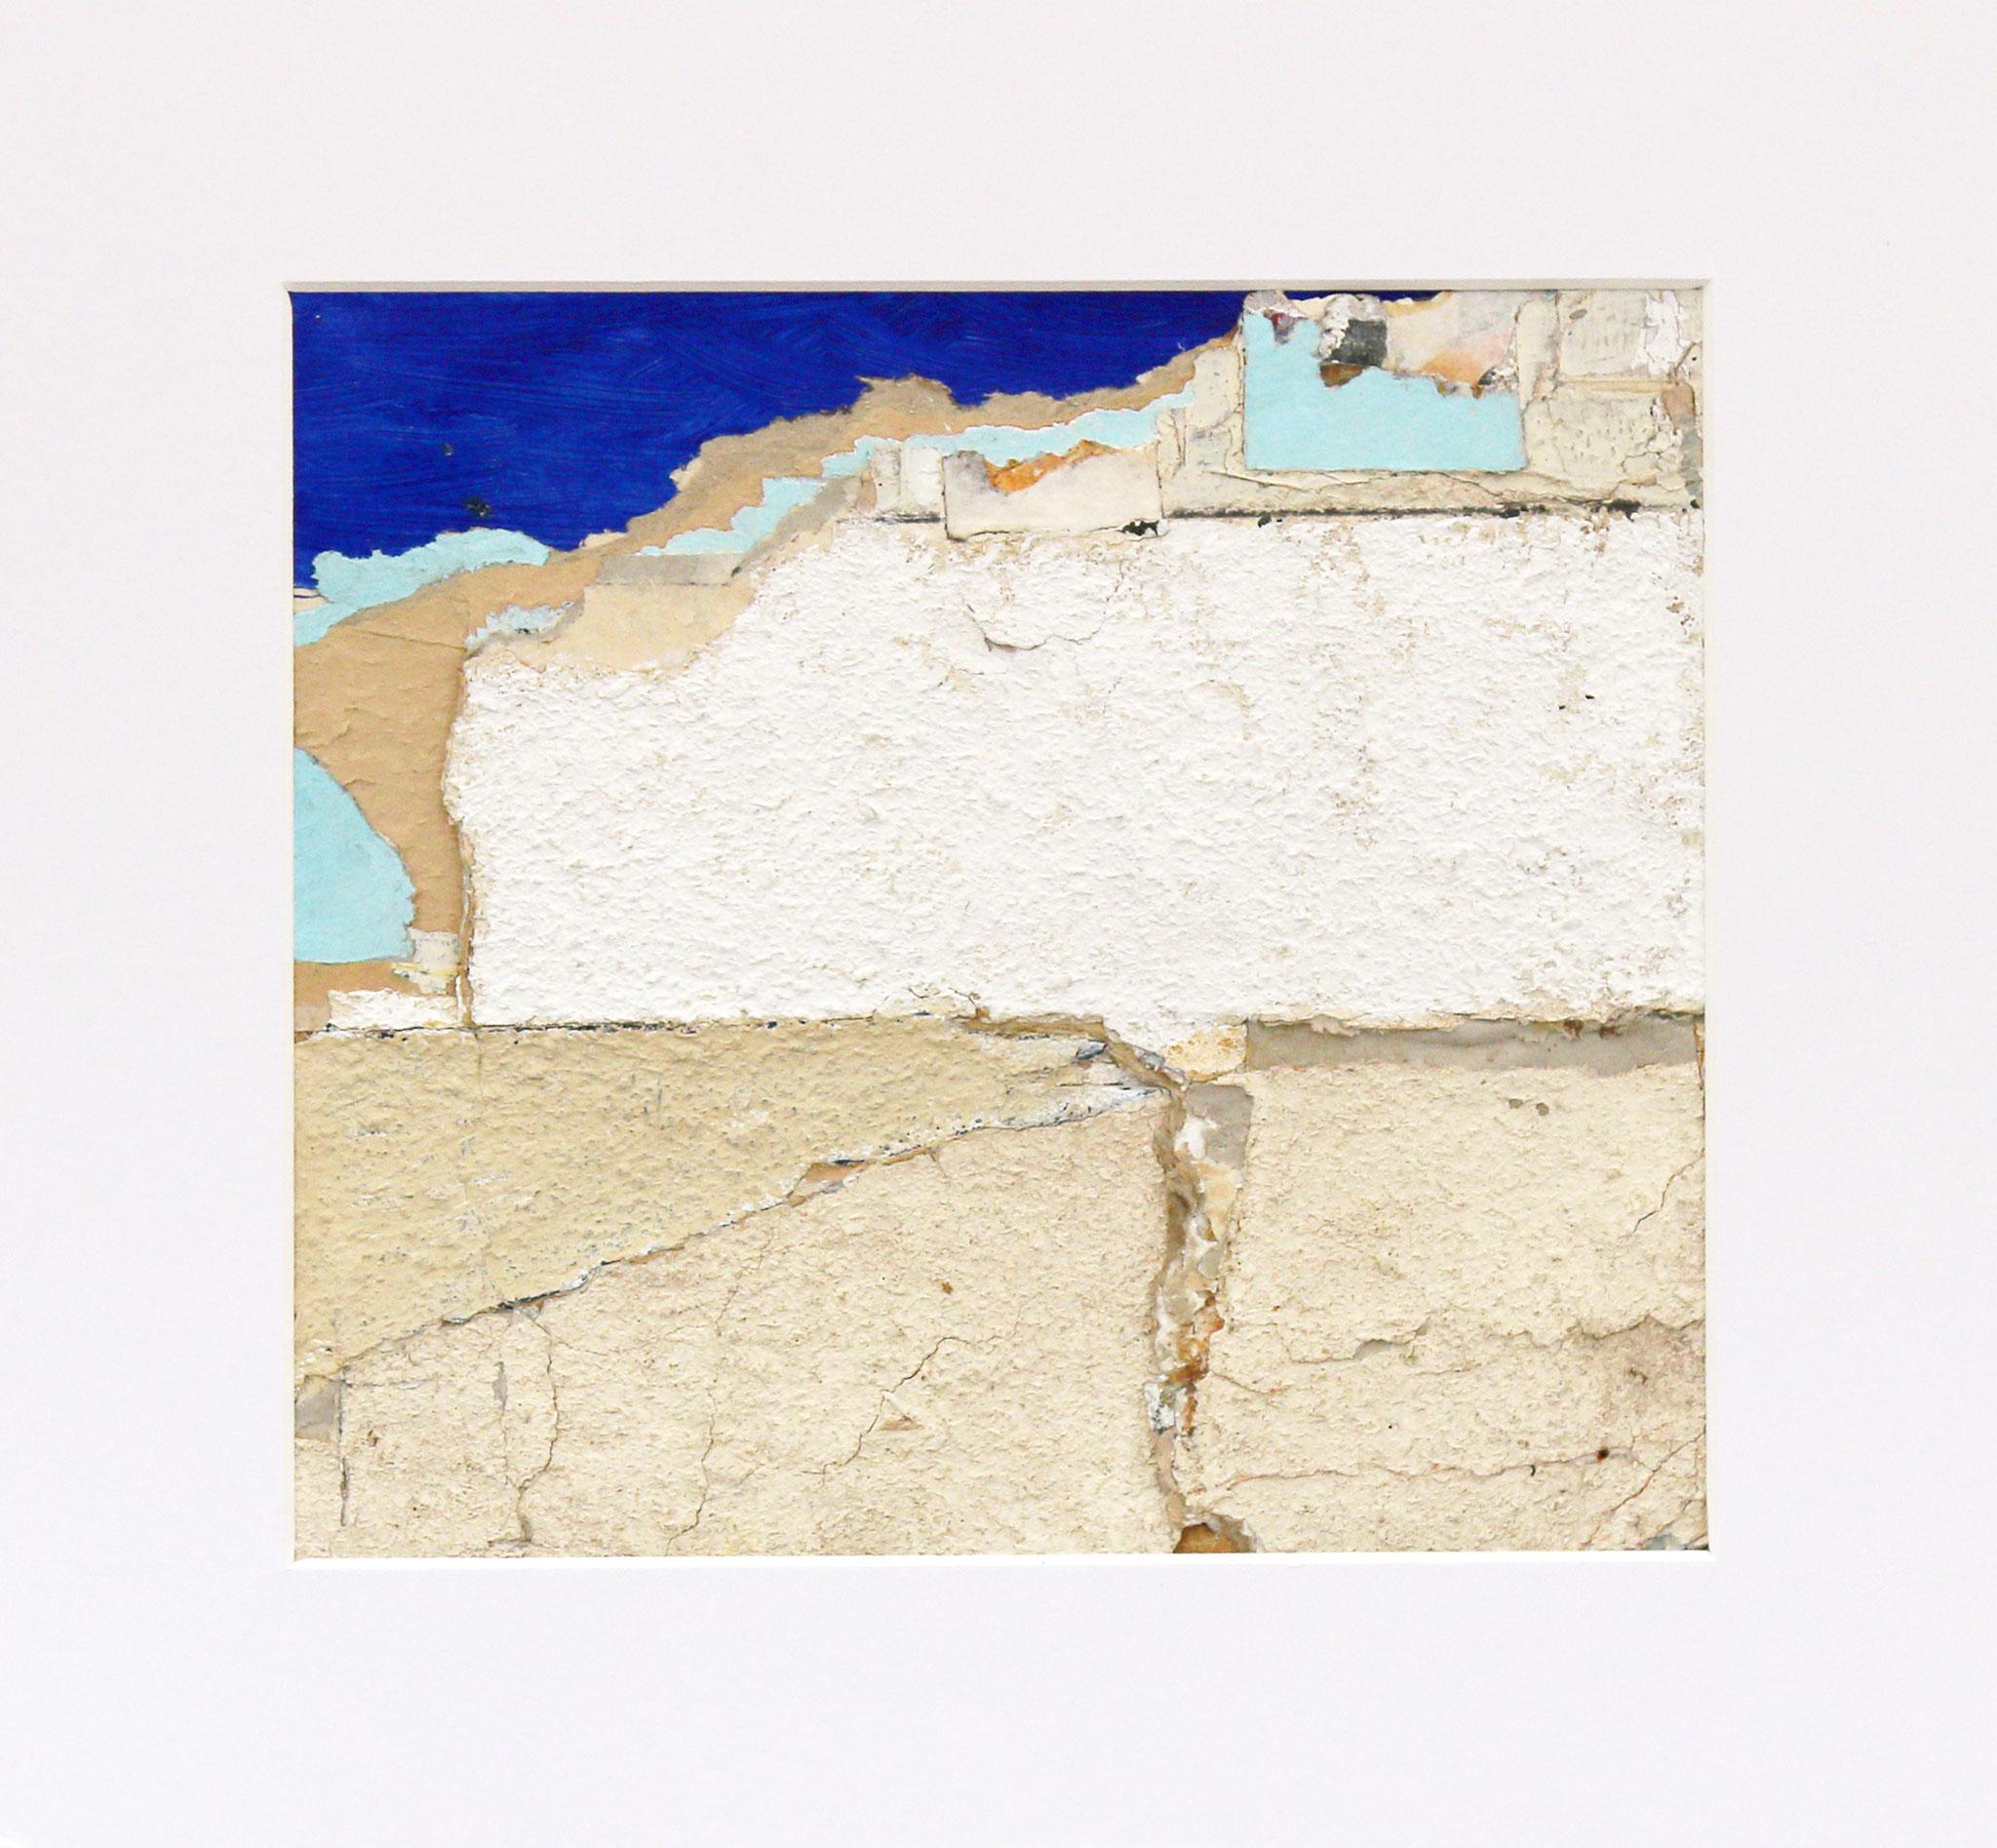 Shoreline 24 x 22 cm Mixed media (35 x 32 cm mounted)